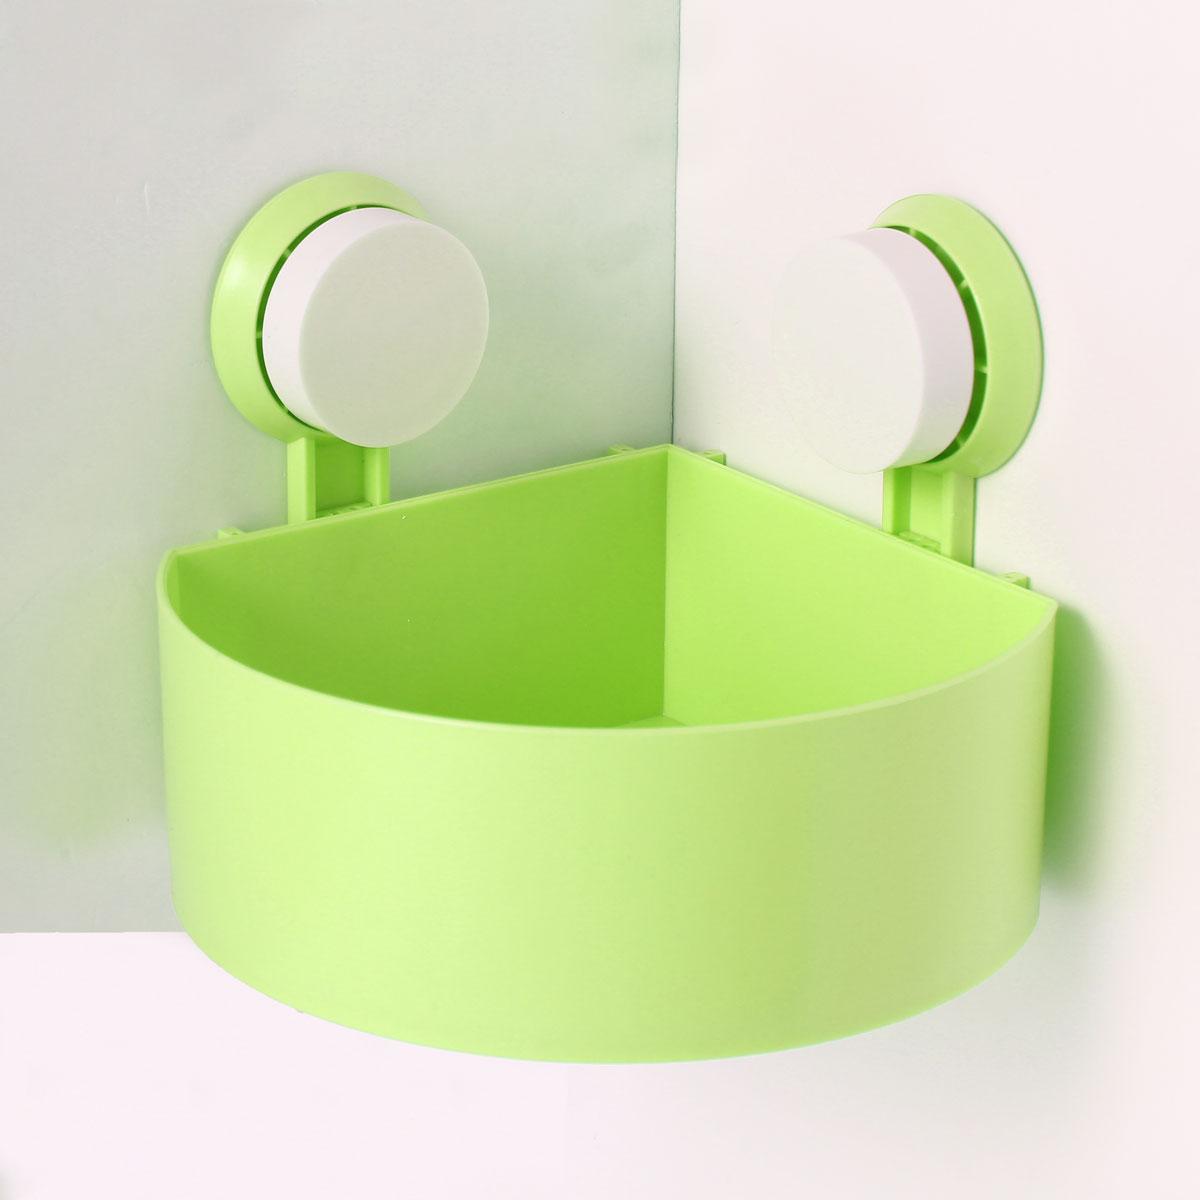 badezimmer aufbewahrung koerbe kreatives haus design. Black Bedroom Furniture Sets. Home Design Ideas